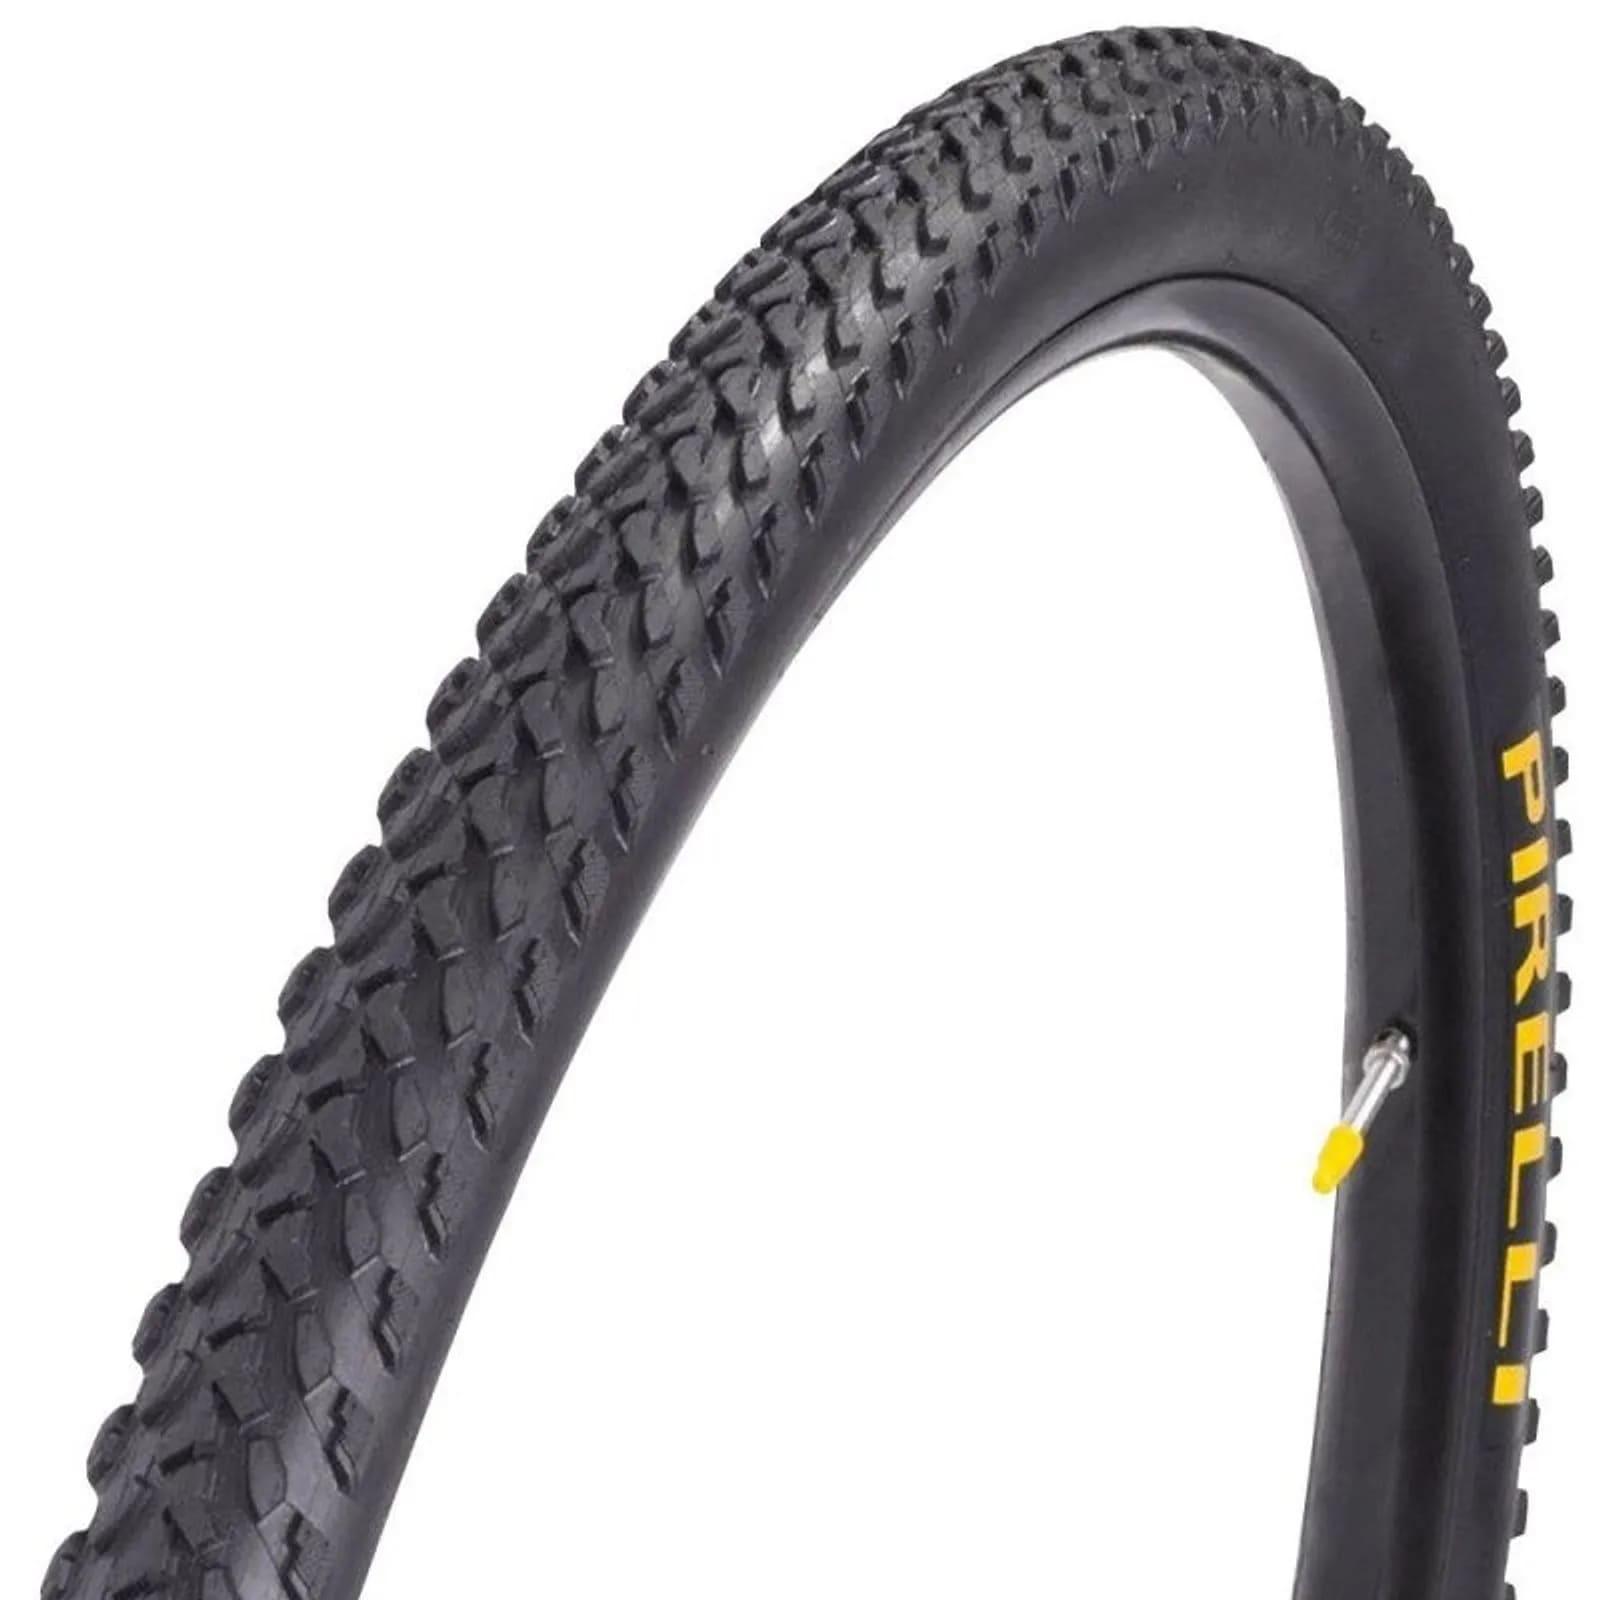 Pneu ciclismo Scorpion 26x2.0 Pirelli Mb2Bicicleta